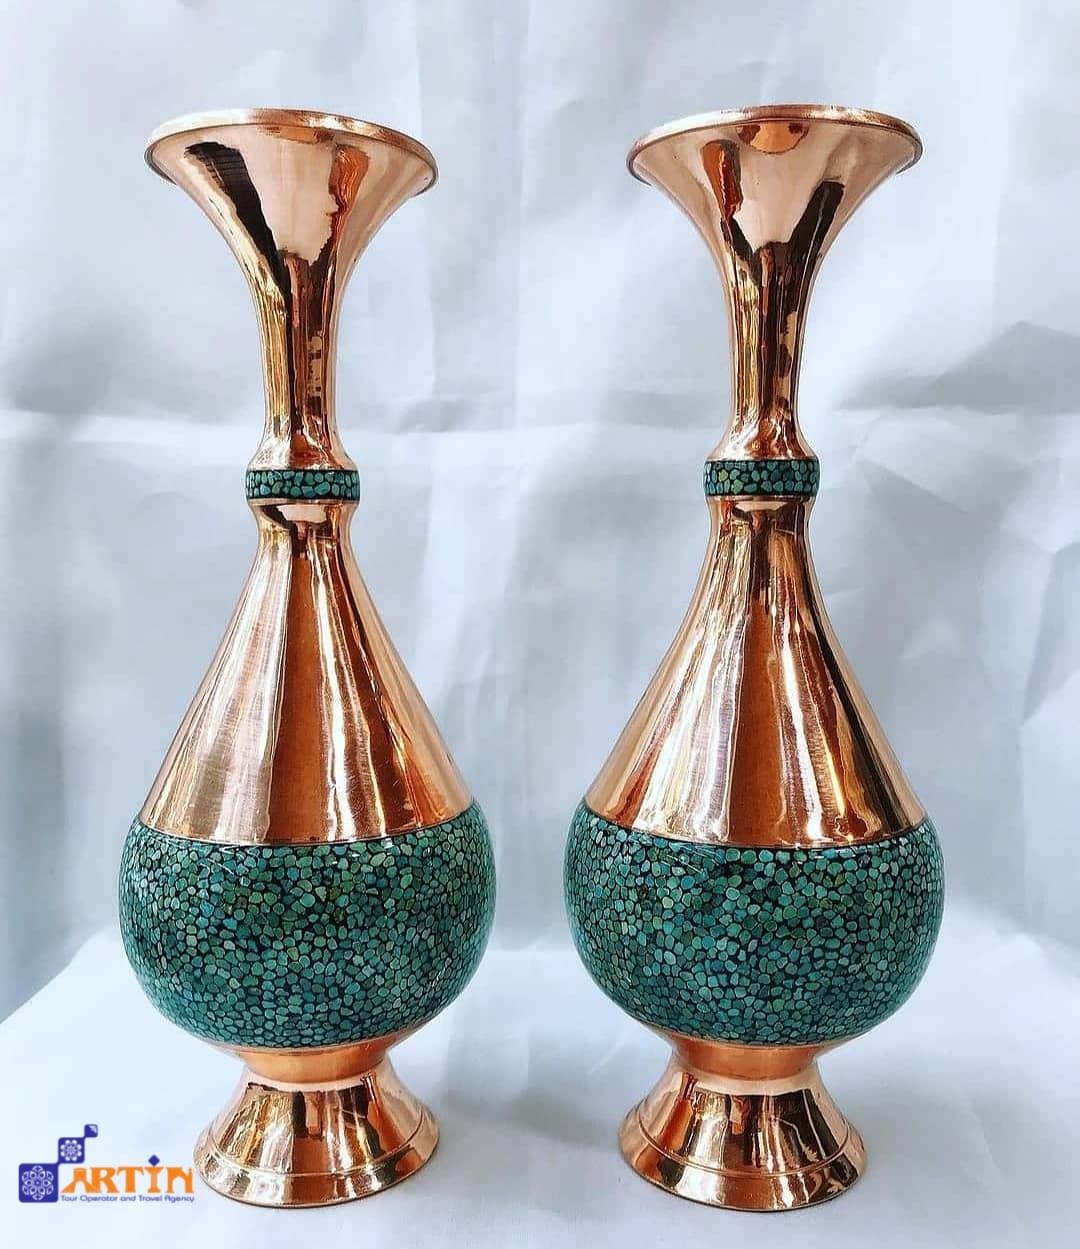 Firooze Kari Persian handicraft art travelartin.com